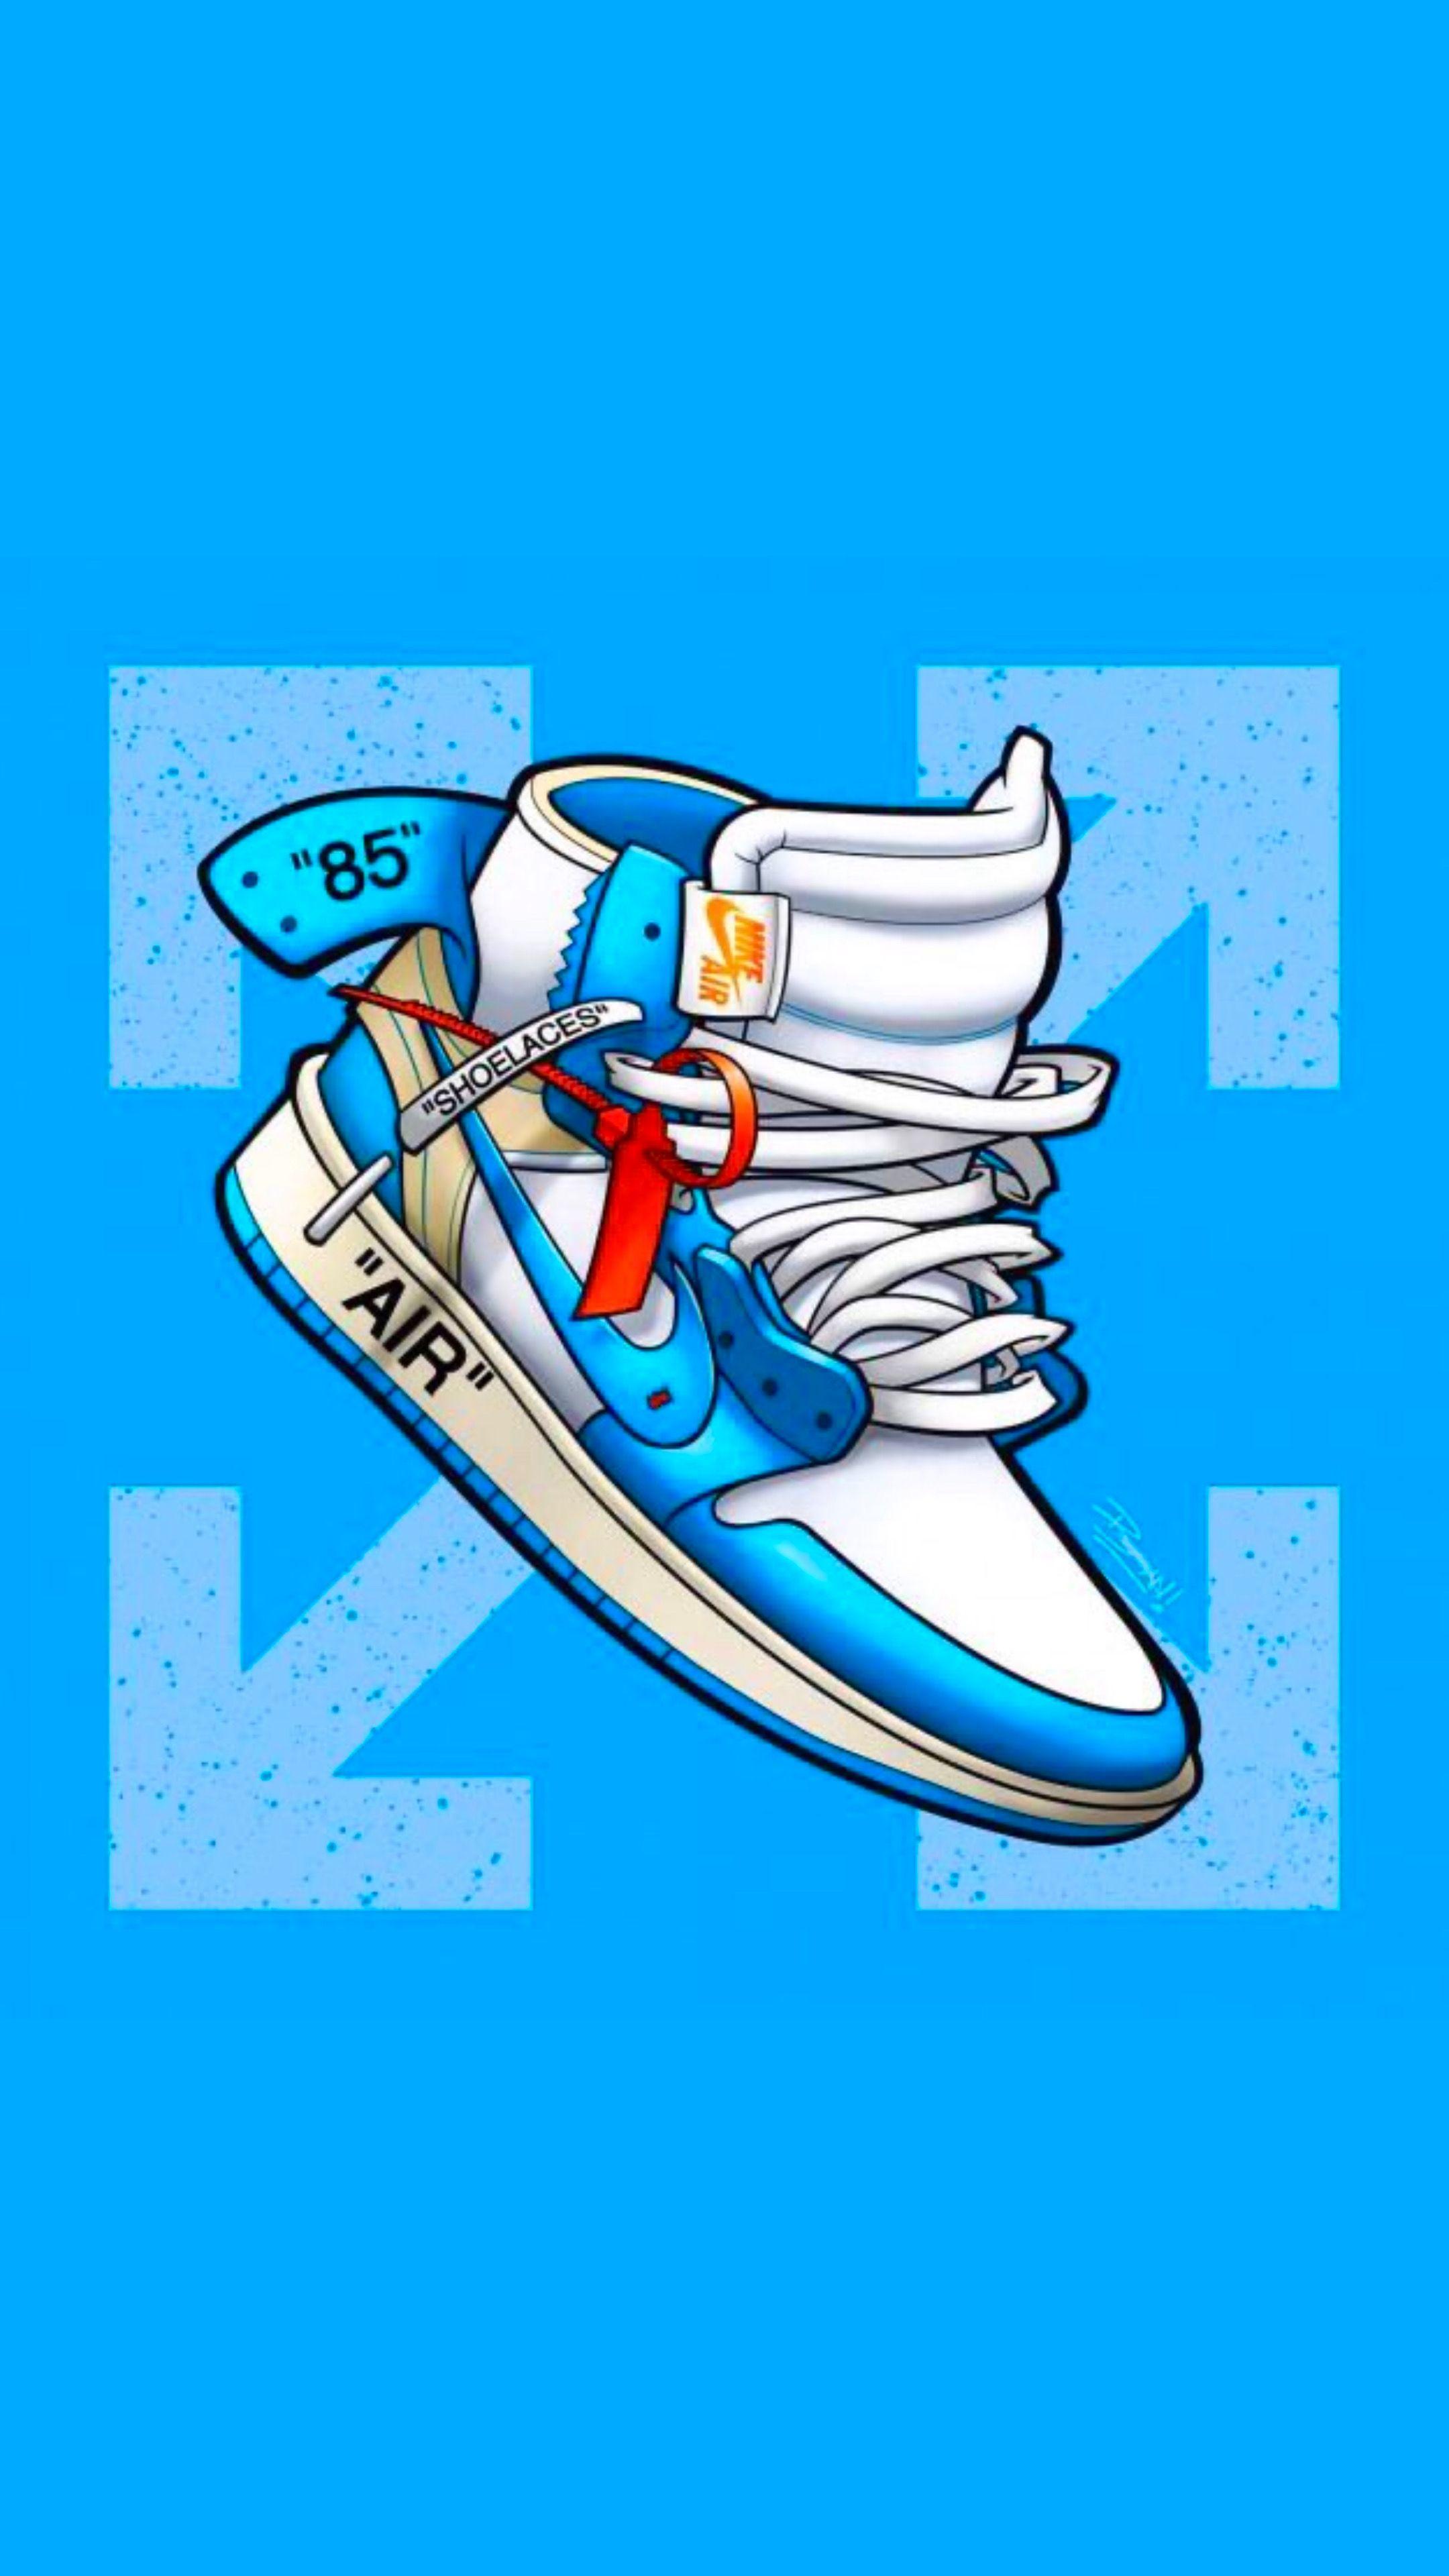 Pin By Alex On Shoe Wallpapers Sneakers Wallpaper Jordan Shoes Wallpaper Hypebeast Iphone Wallpaper